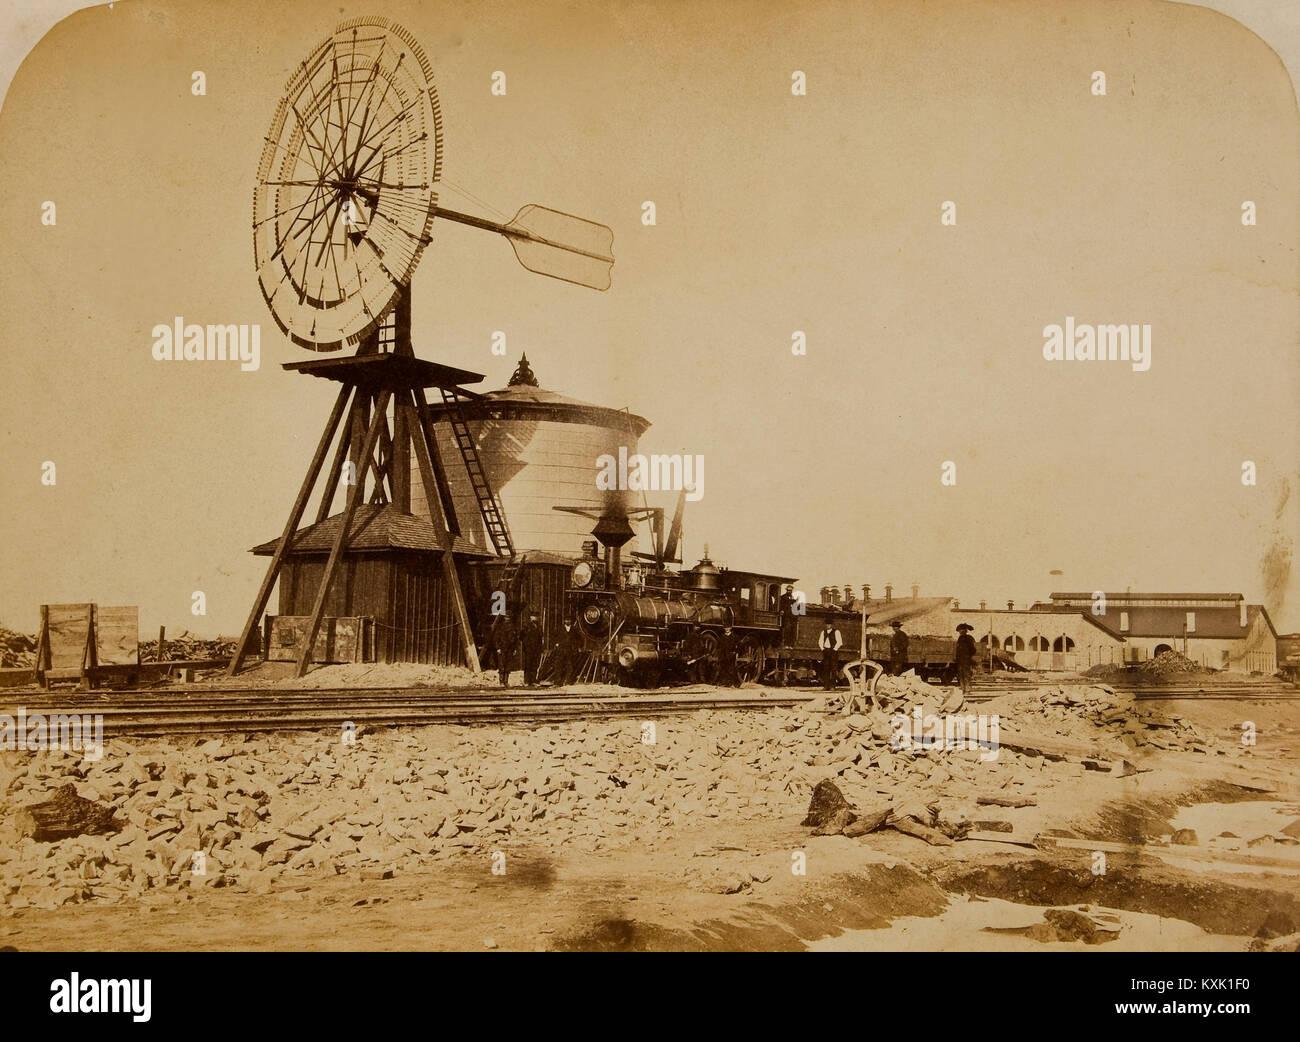 Wyoming Railroad Photo, Circa 1868 - 1869; 'Windmill / Laramie, Wyoming' - Stock Image